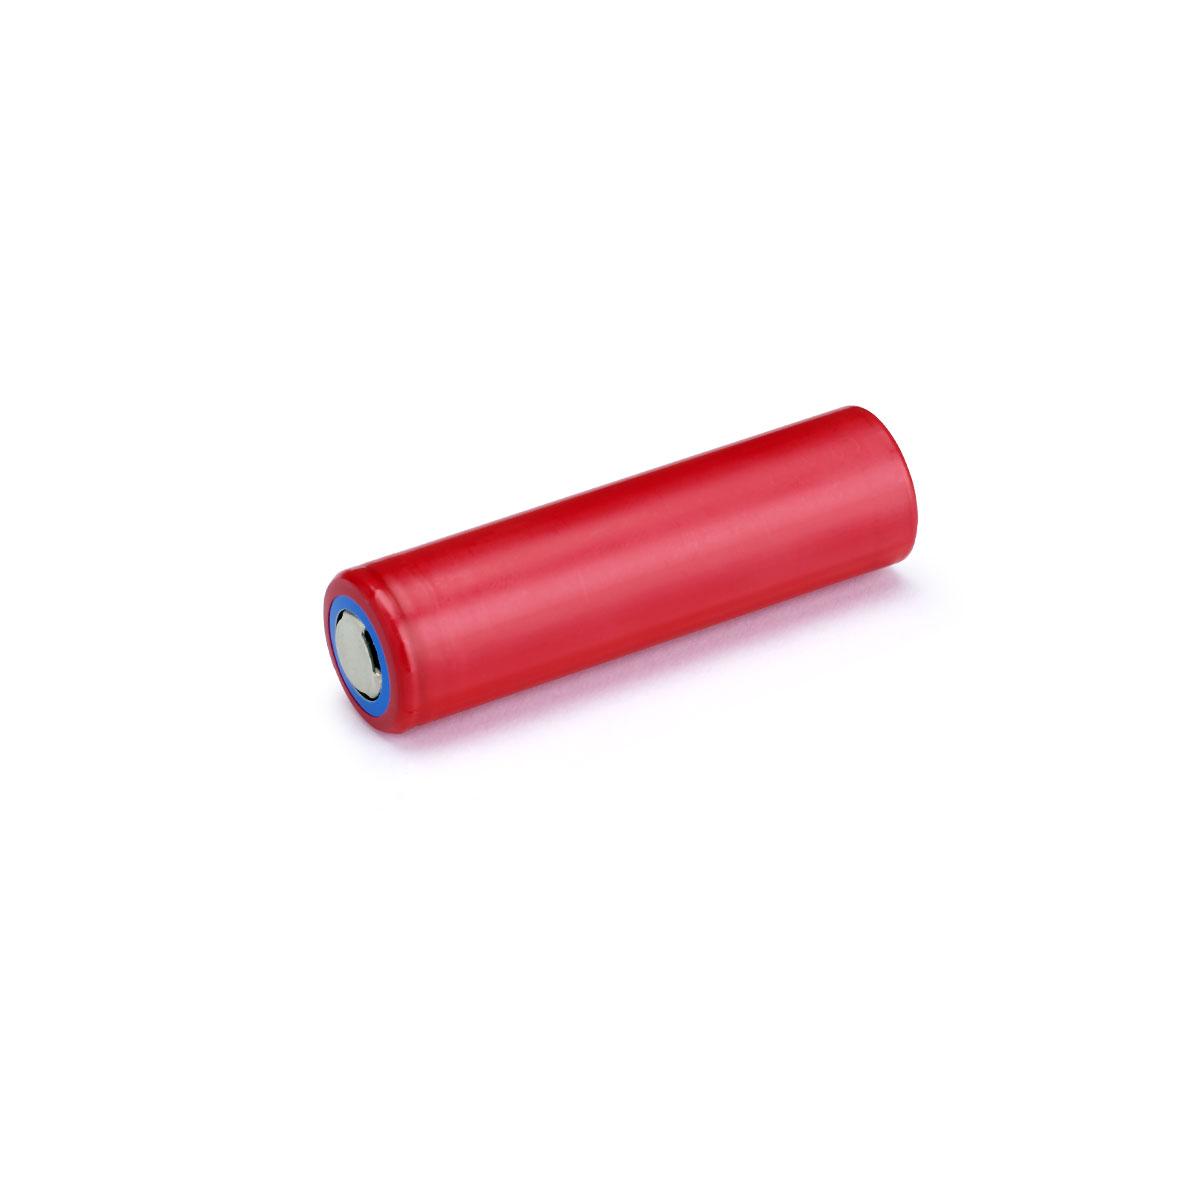 Sanyo GA 18650 Rechargeable Battery